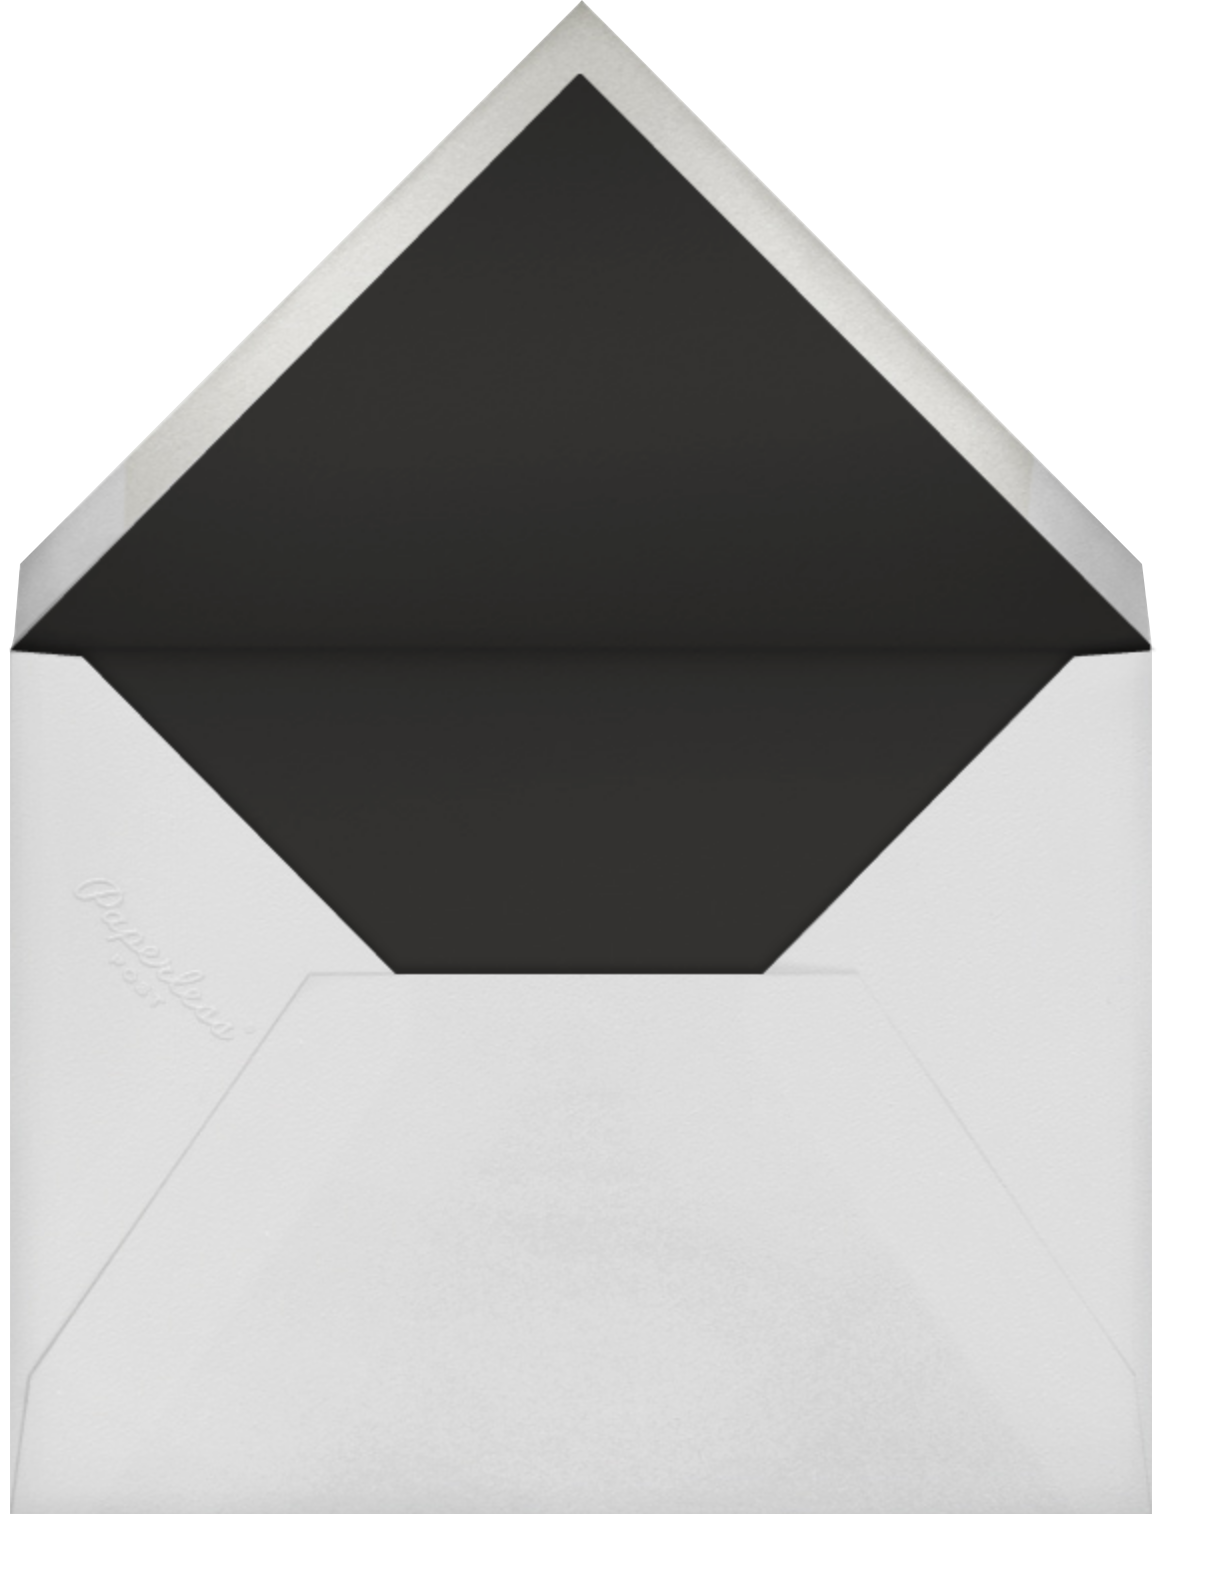 Belle Boulevard (Invitation) - Black - kate spade new york - Envelope